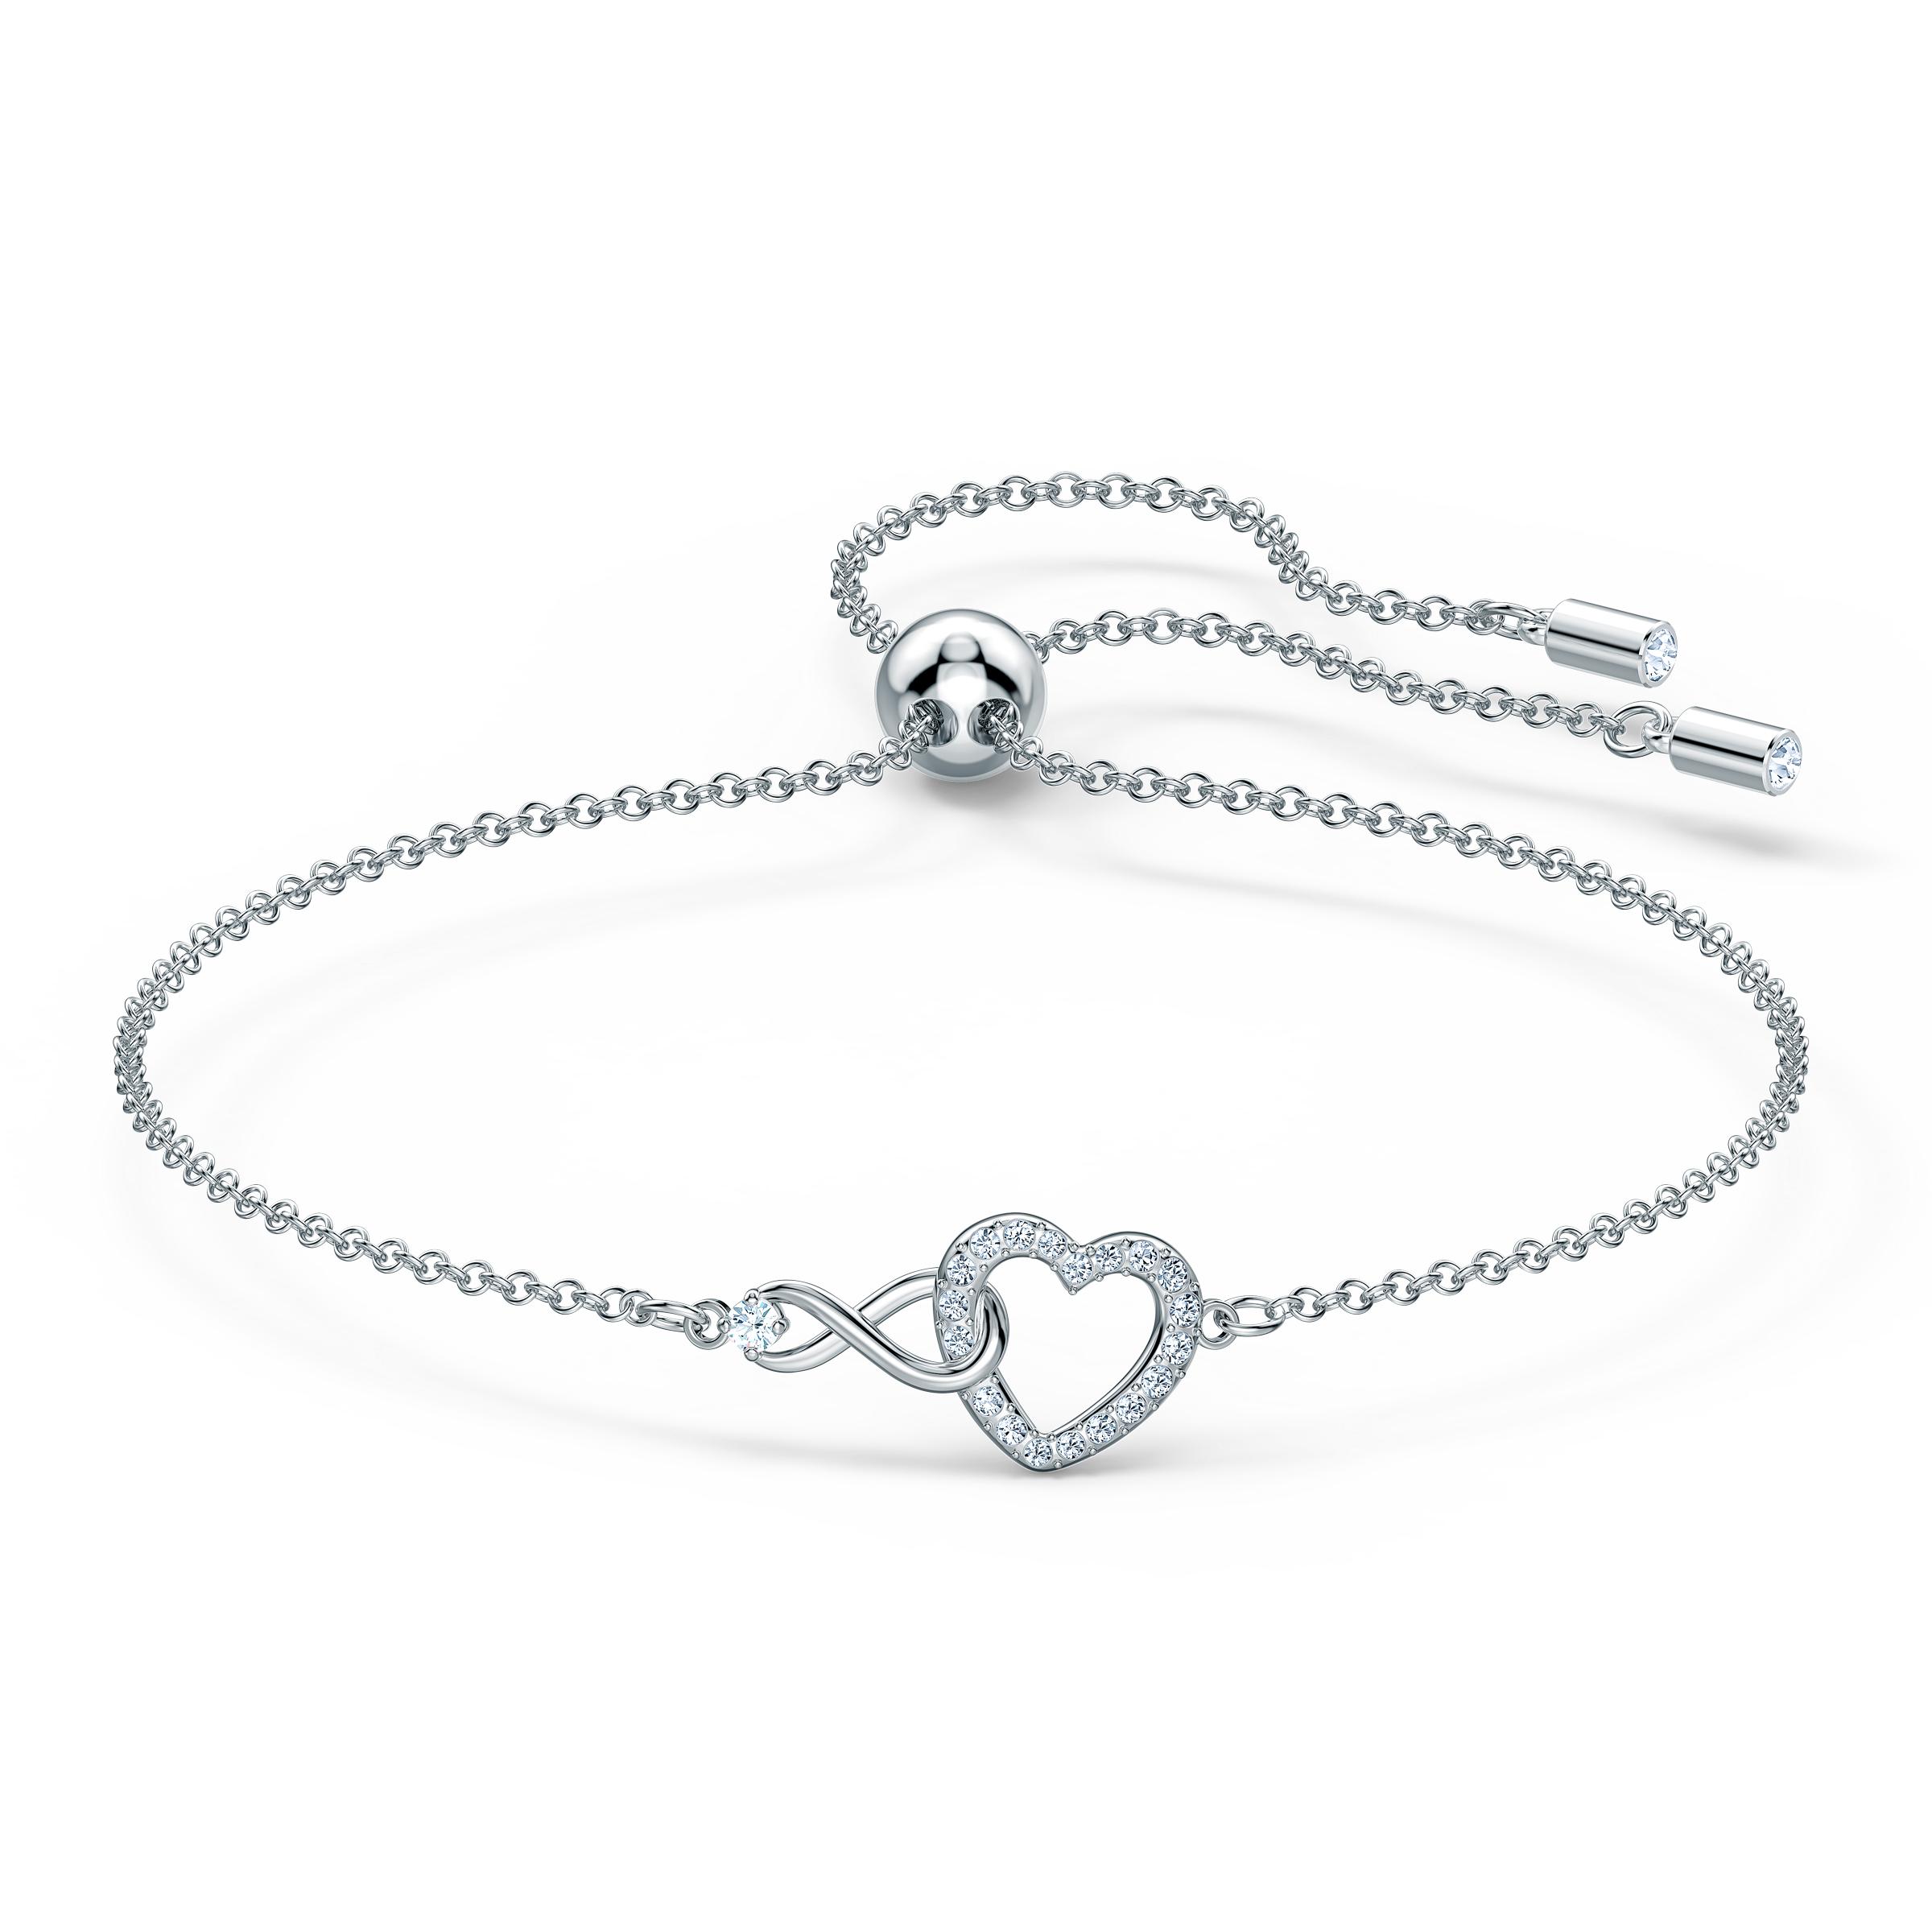 Bracelet Swarovski Infinity Heart, blanc, métal rhodié, Swarovski